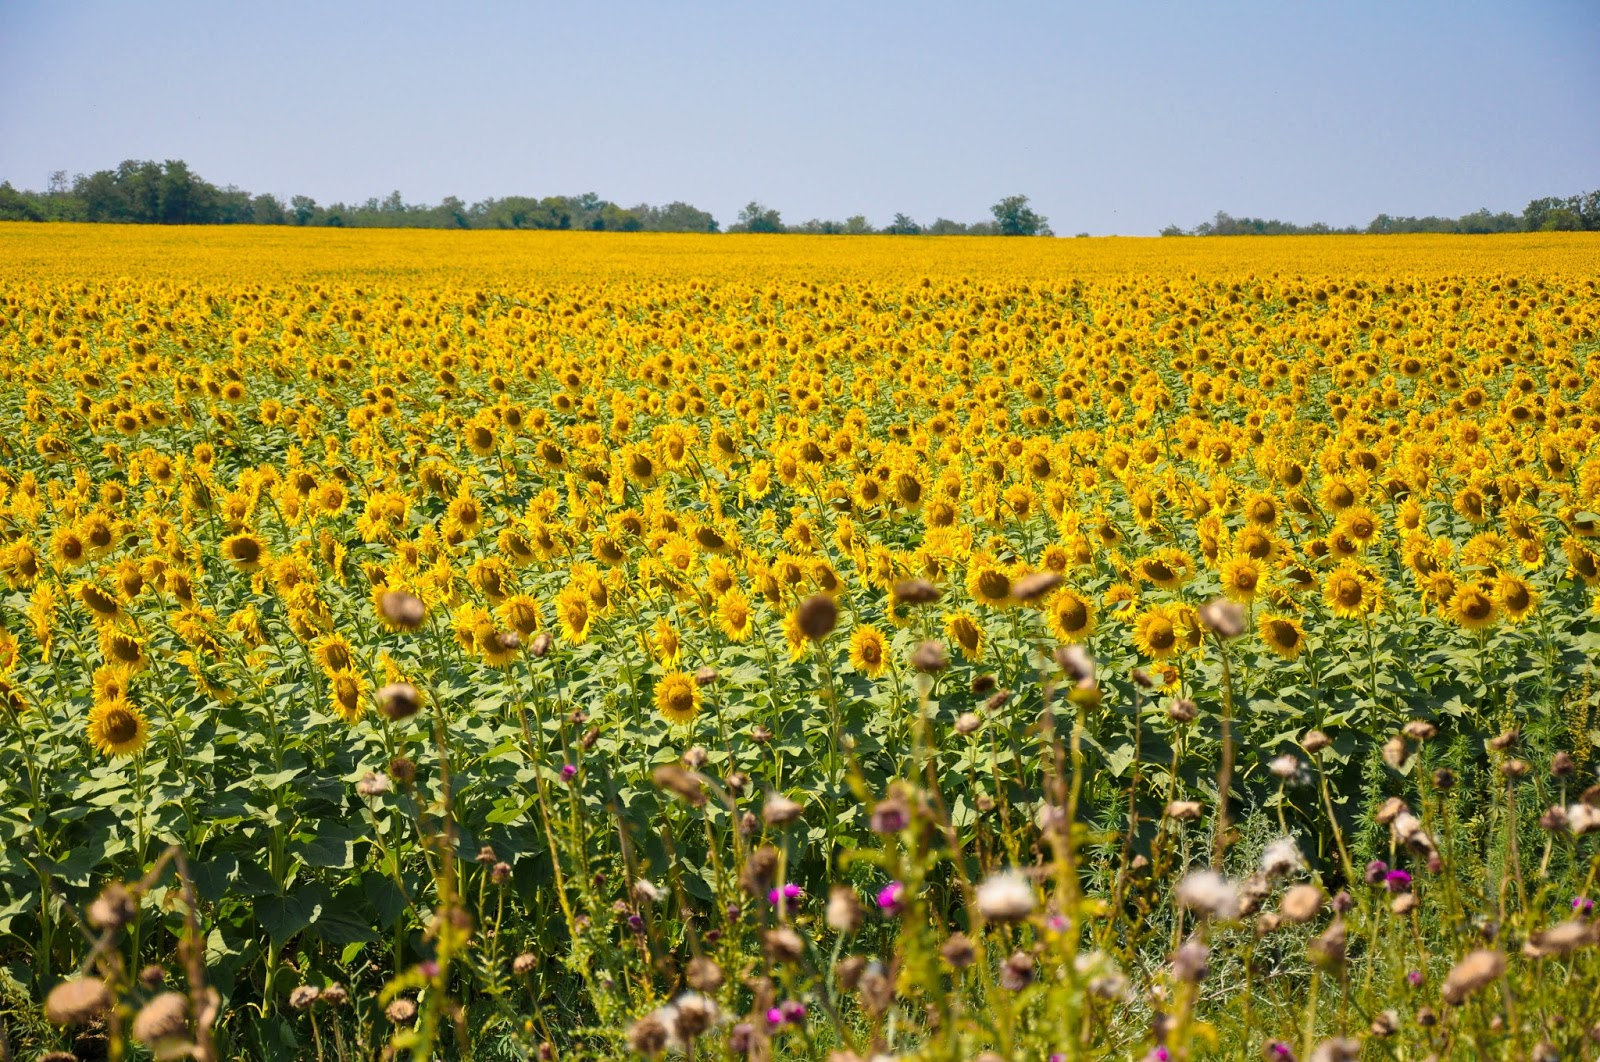 Sunflower field, Varna, Bulgaria